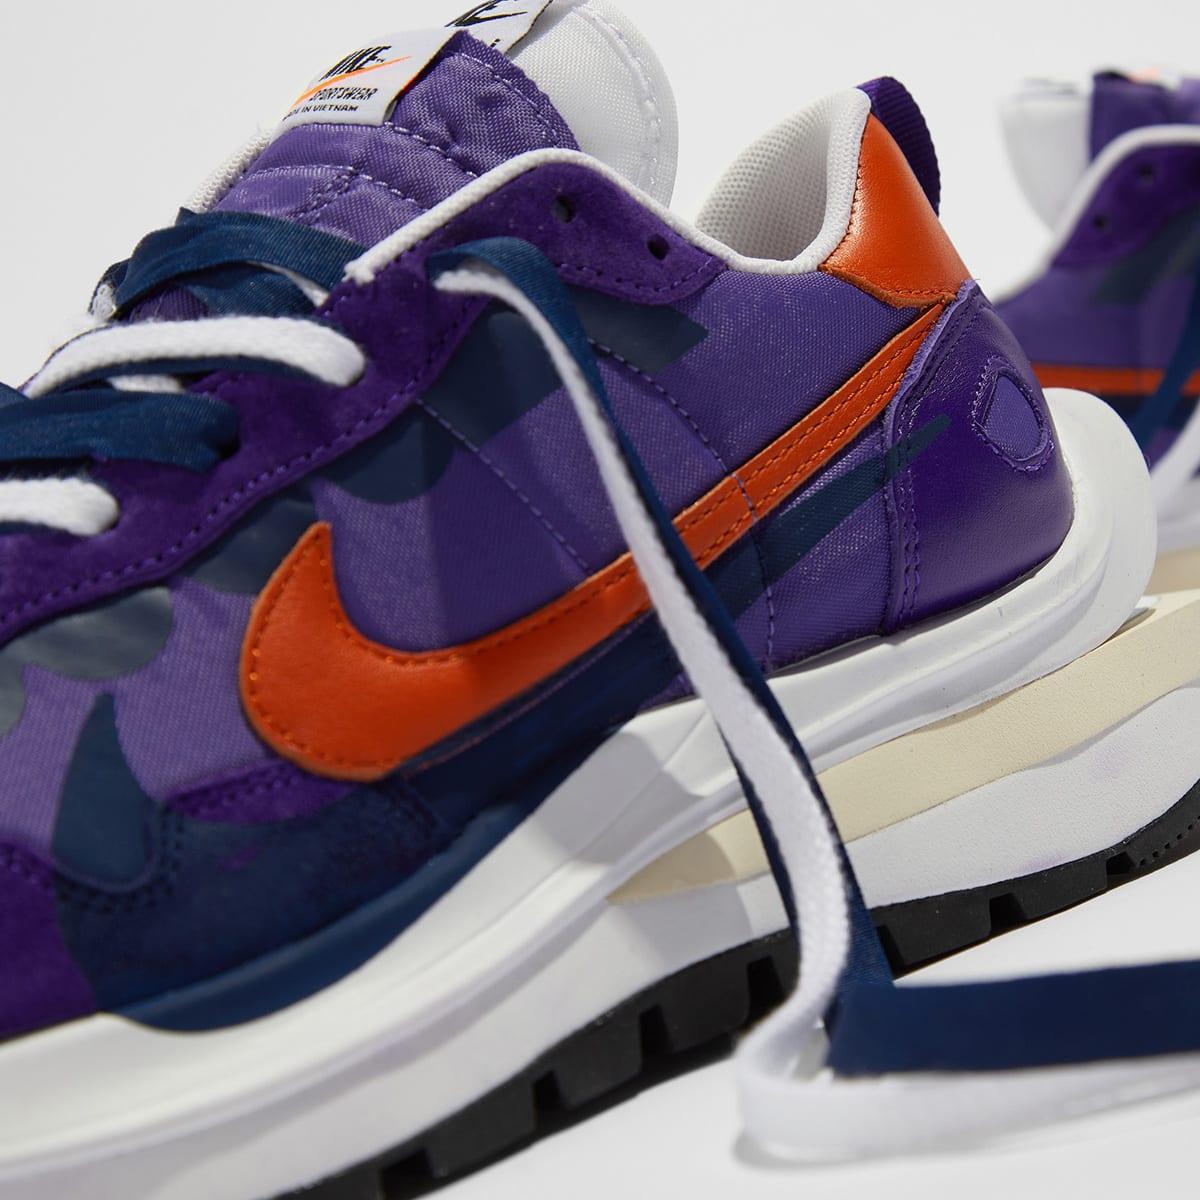 Nike x Sacai Vaporwaffle - DD1875-500